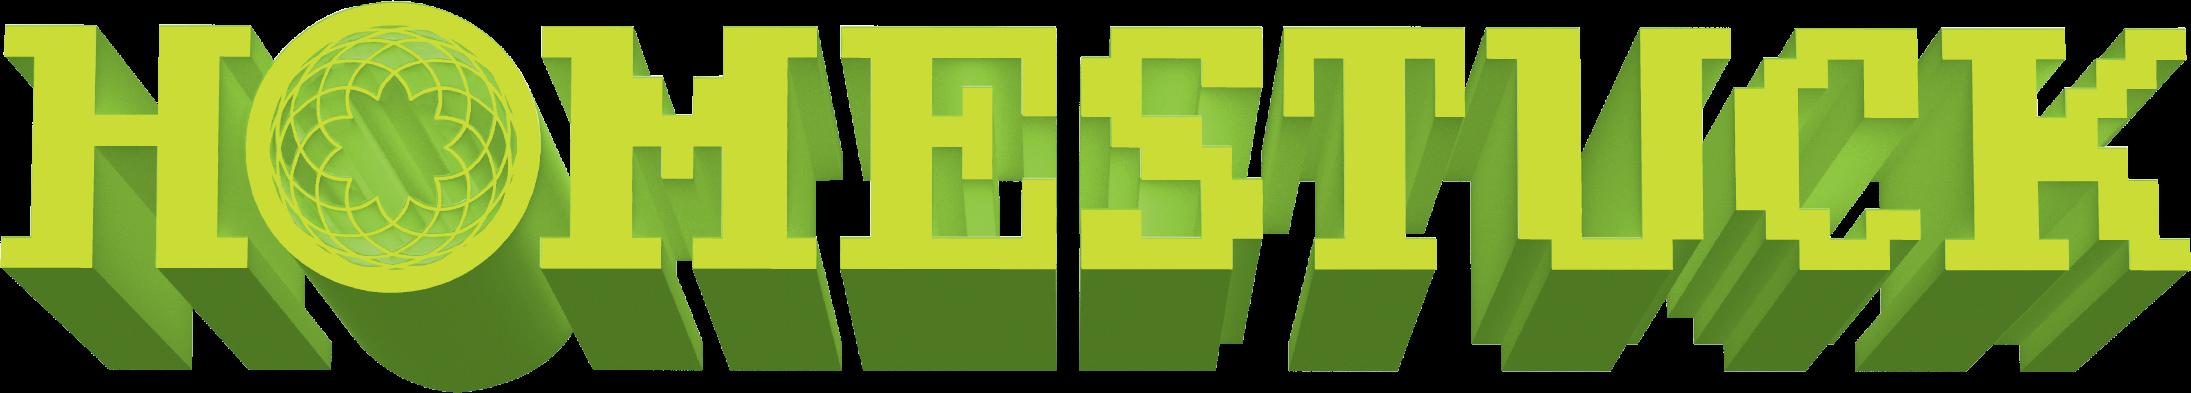 File:Homestuck logo.png